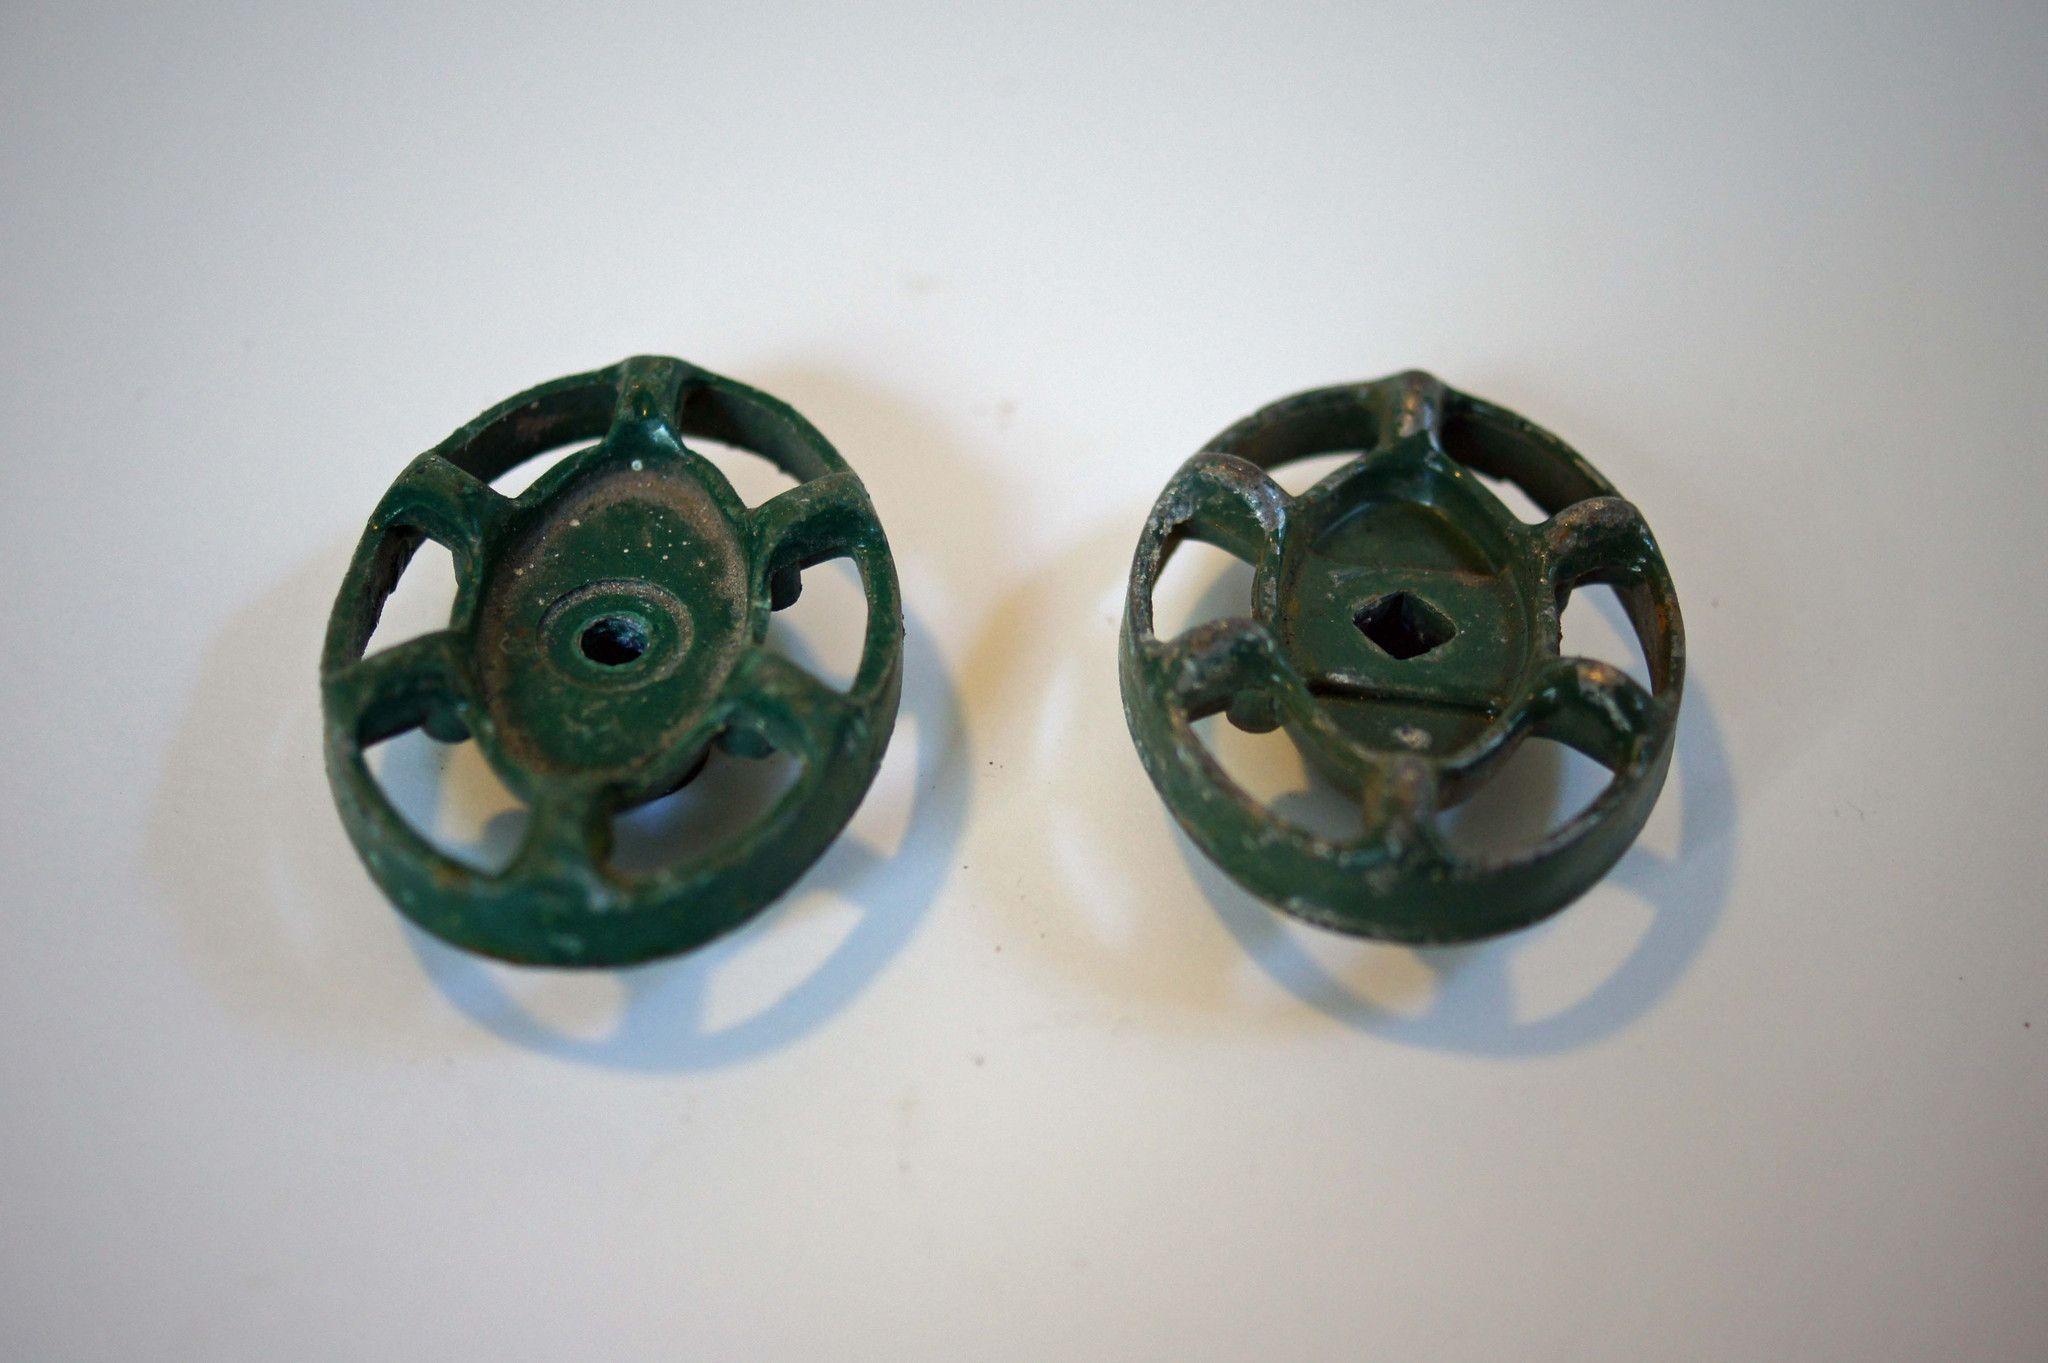 Vintage Green Metal Faucet Knobs - Set of 2